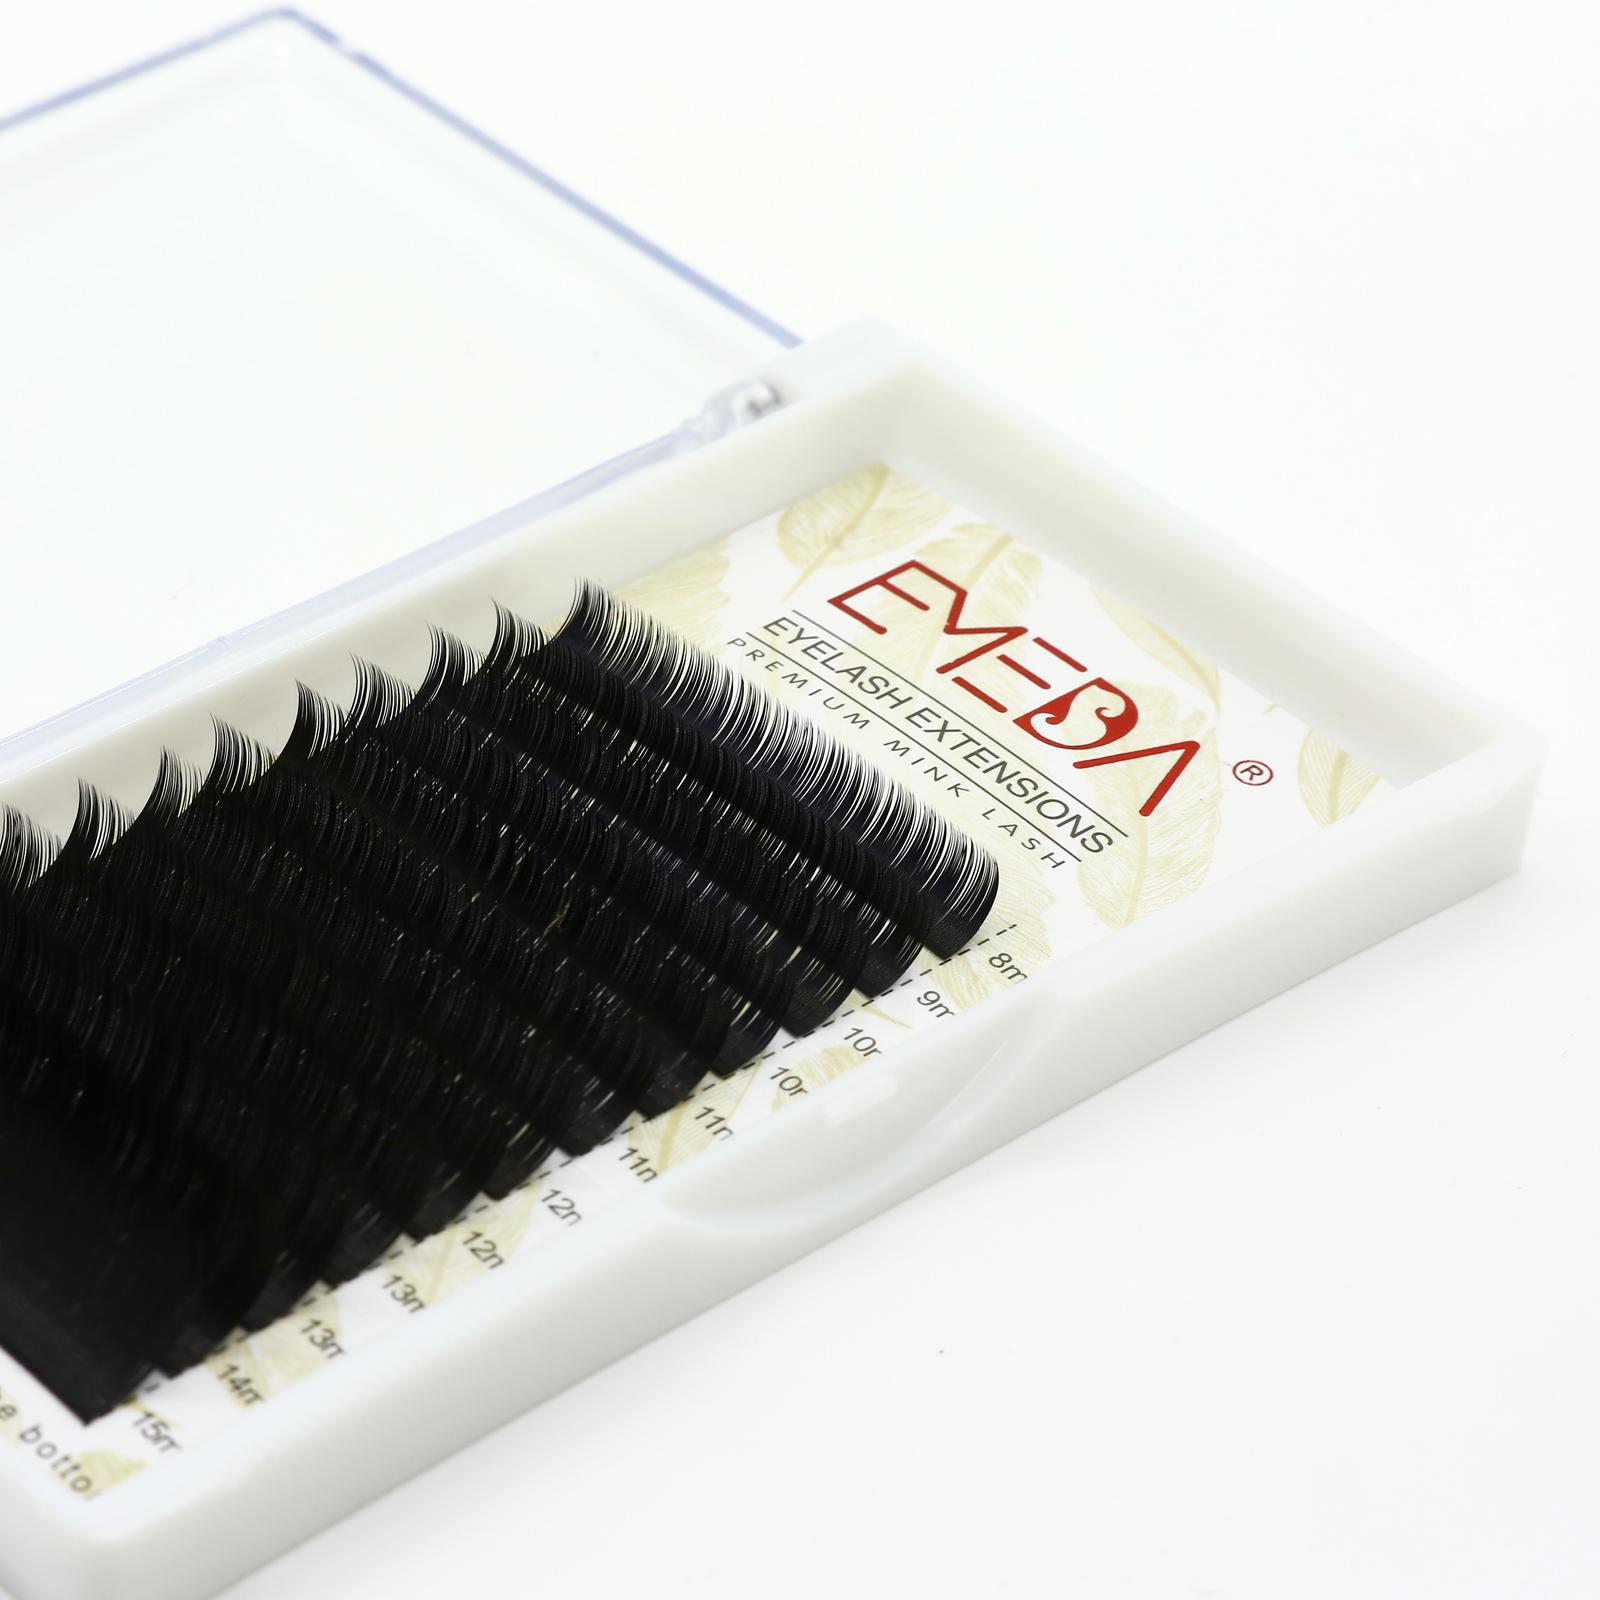 60ef1e93cd6 Wholesale ODM OEM Eyelash Extensions In Korea PY1 - Emeda eyelash